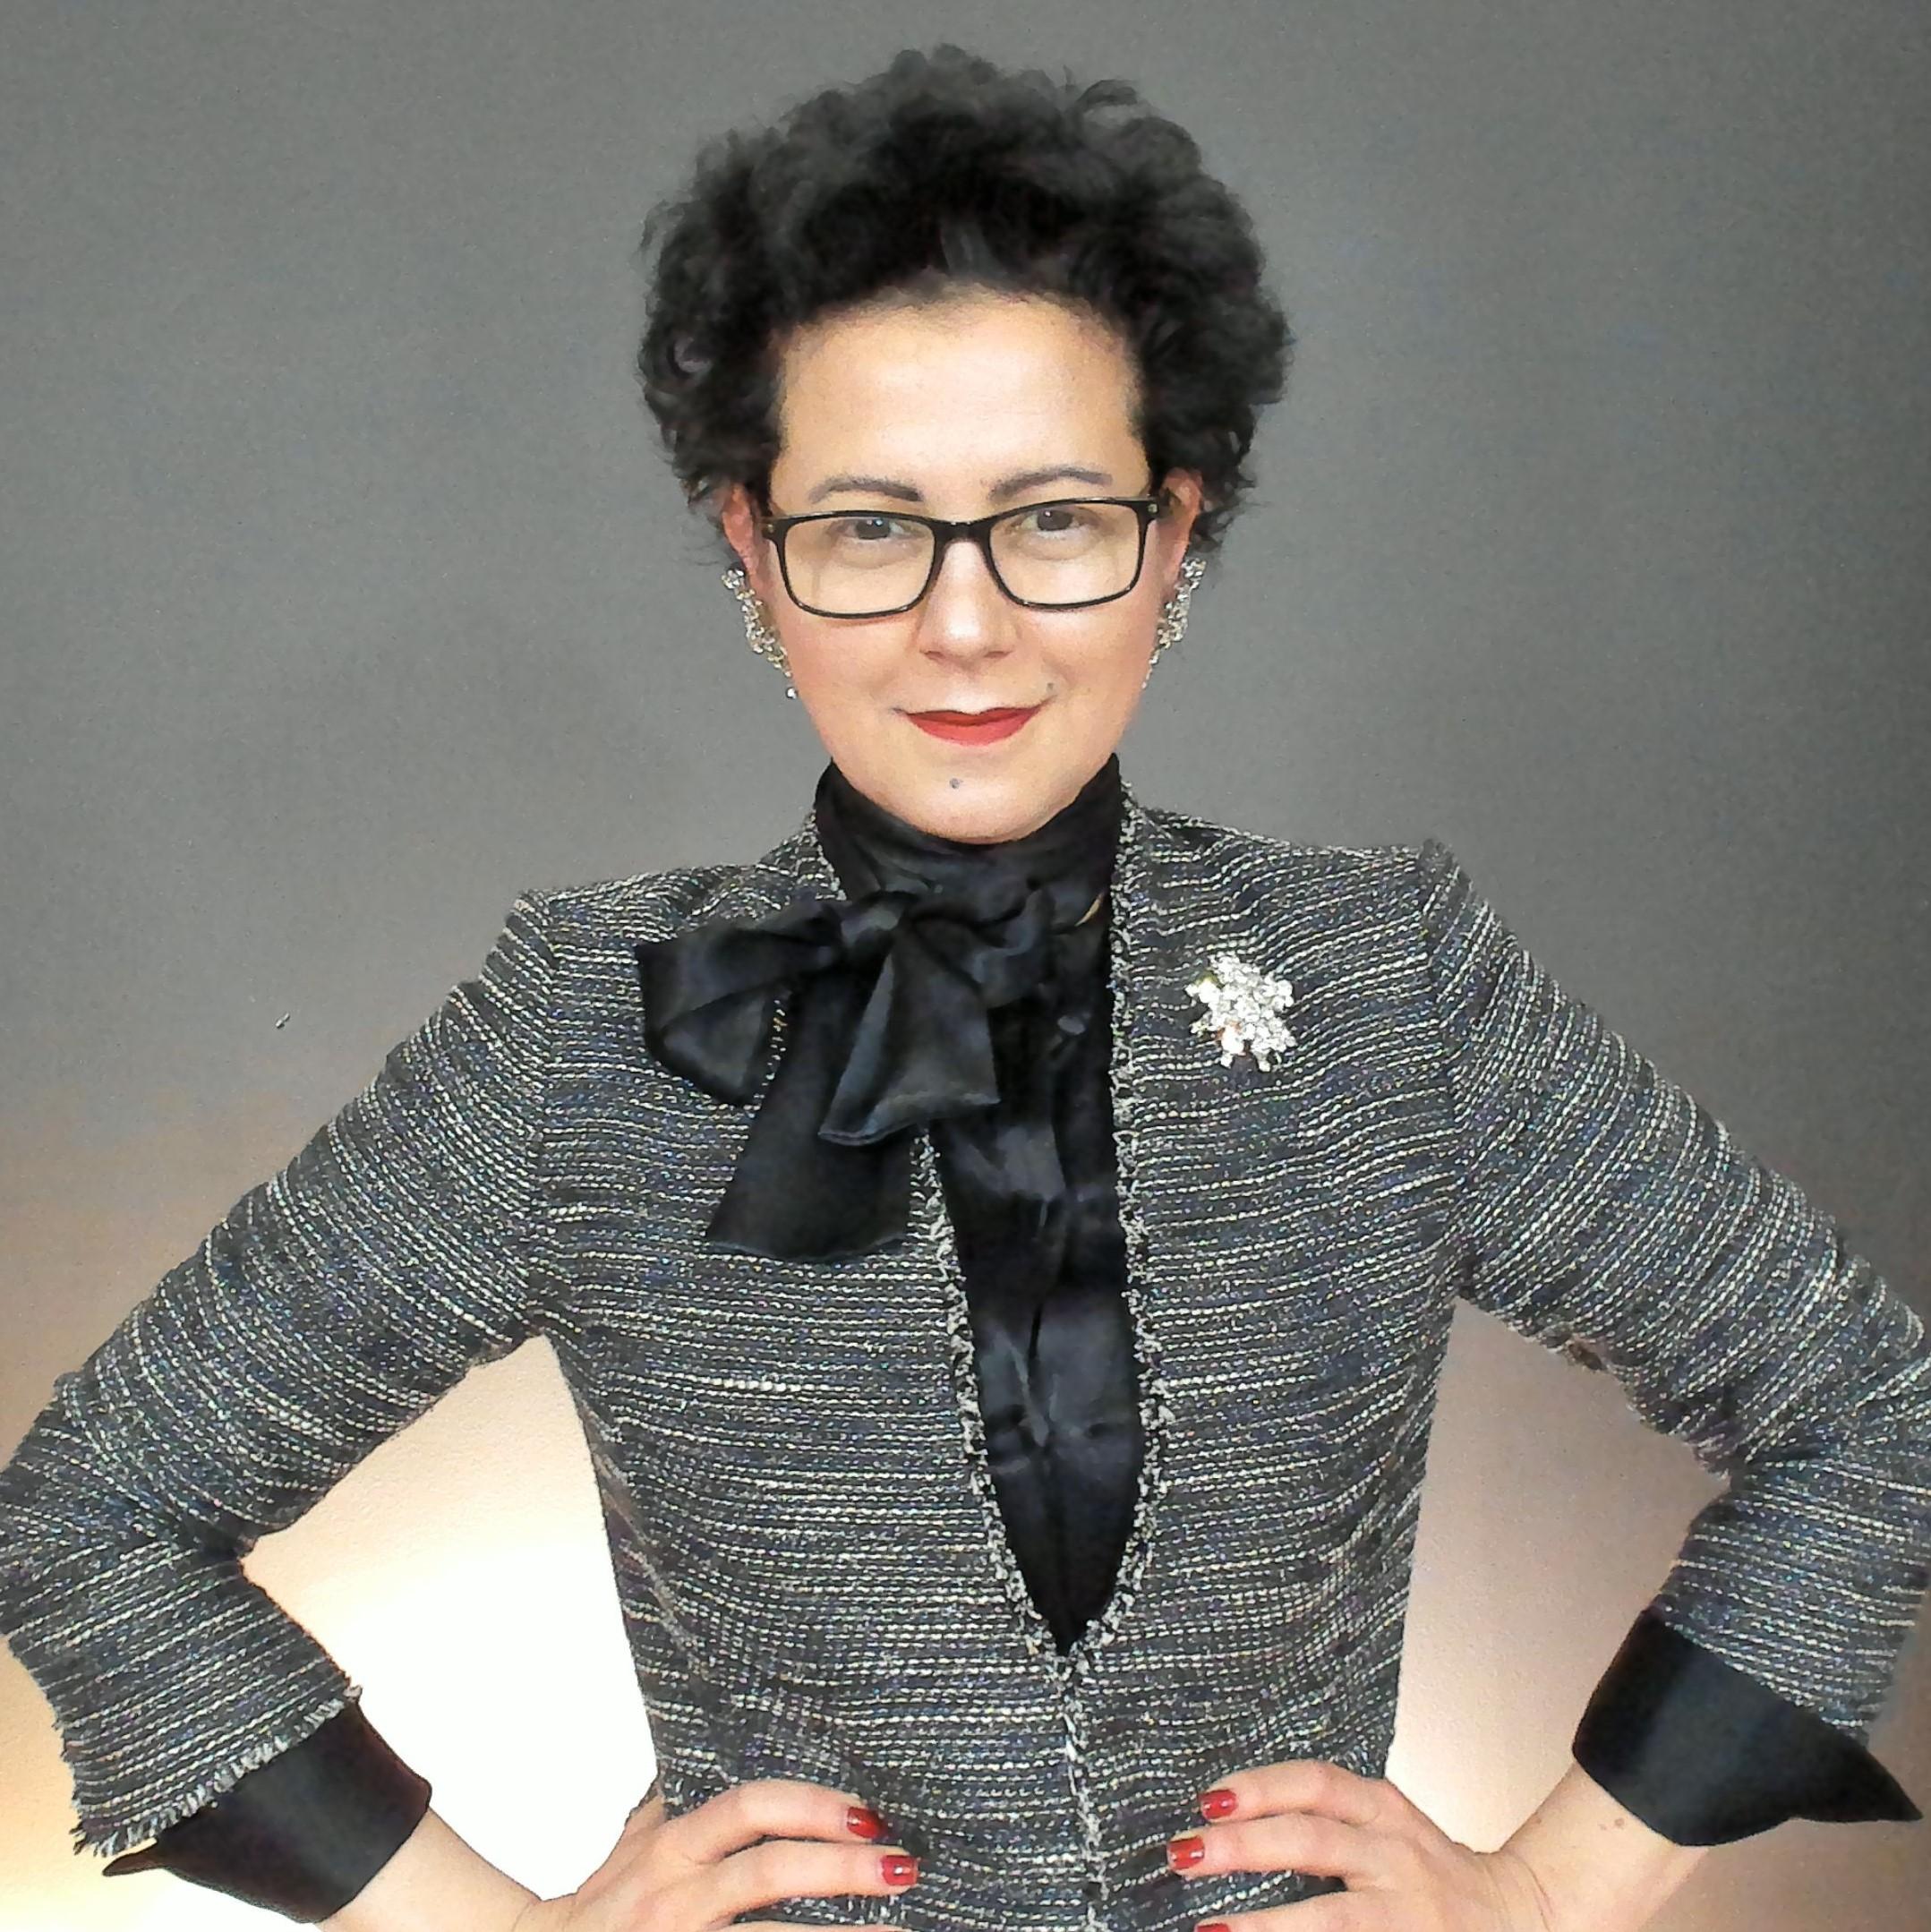 Susan Ibitz